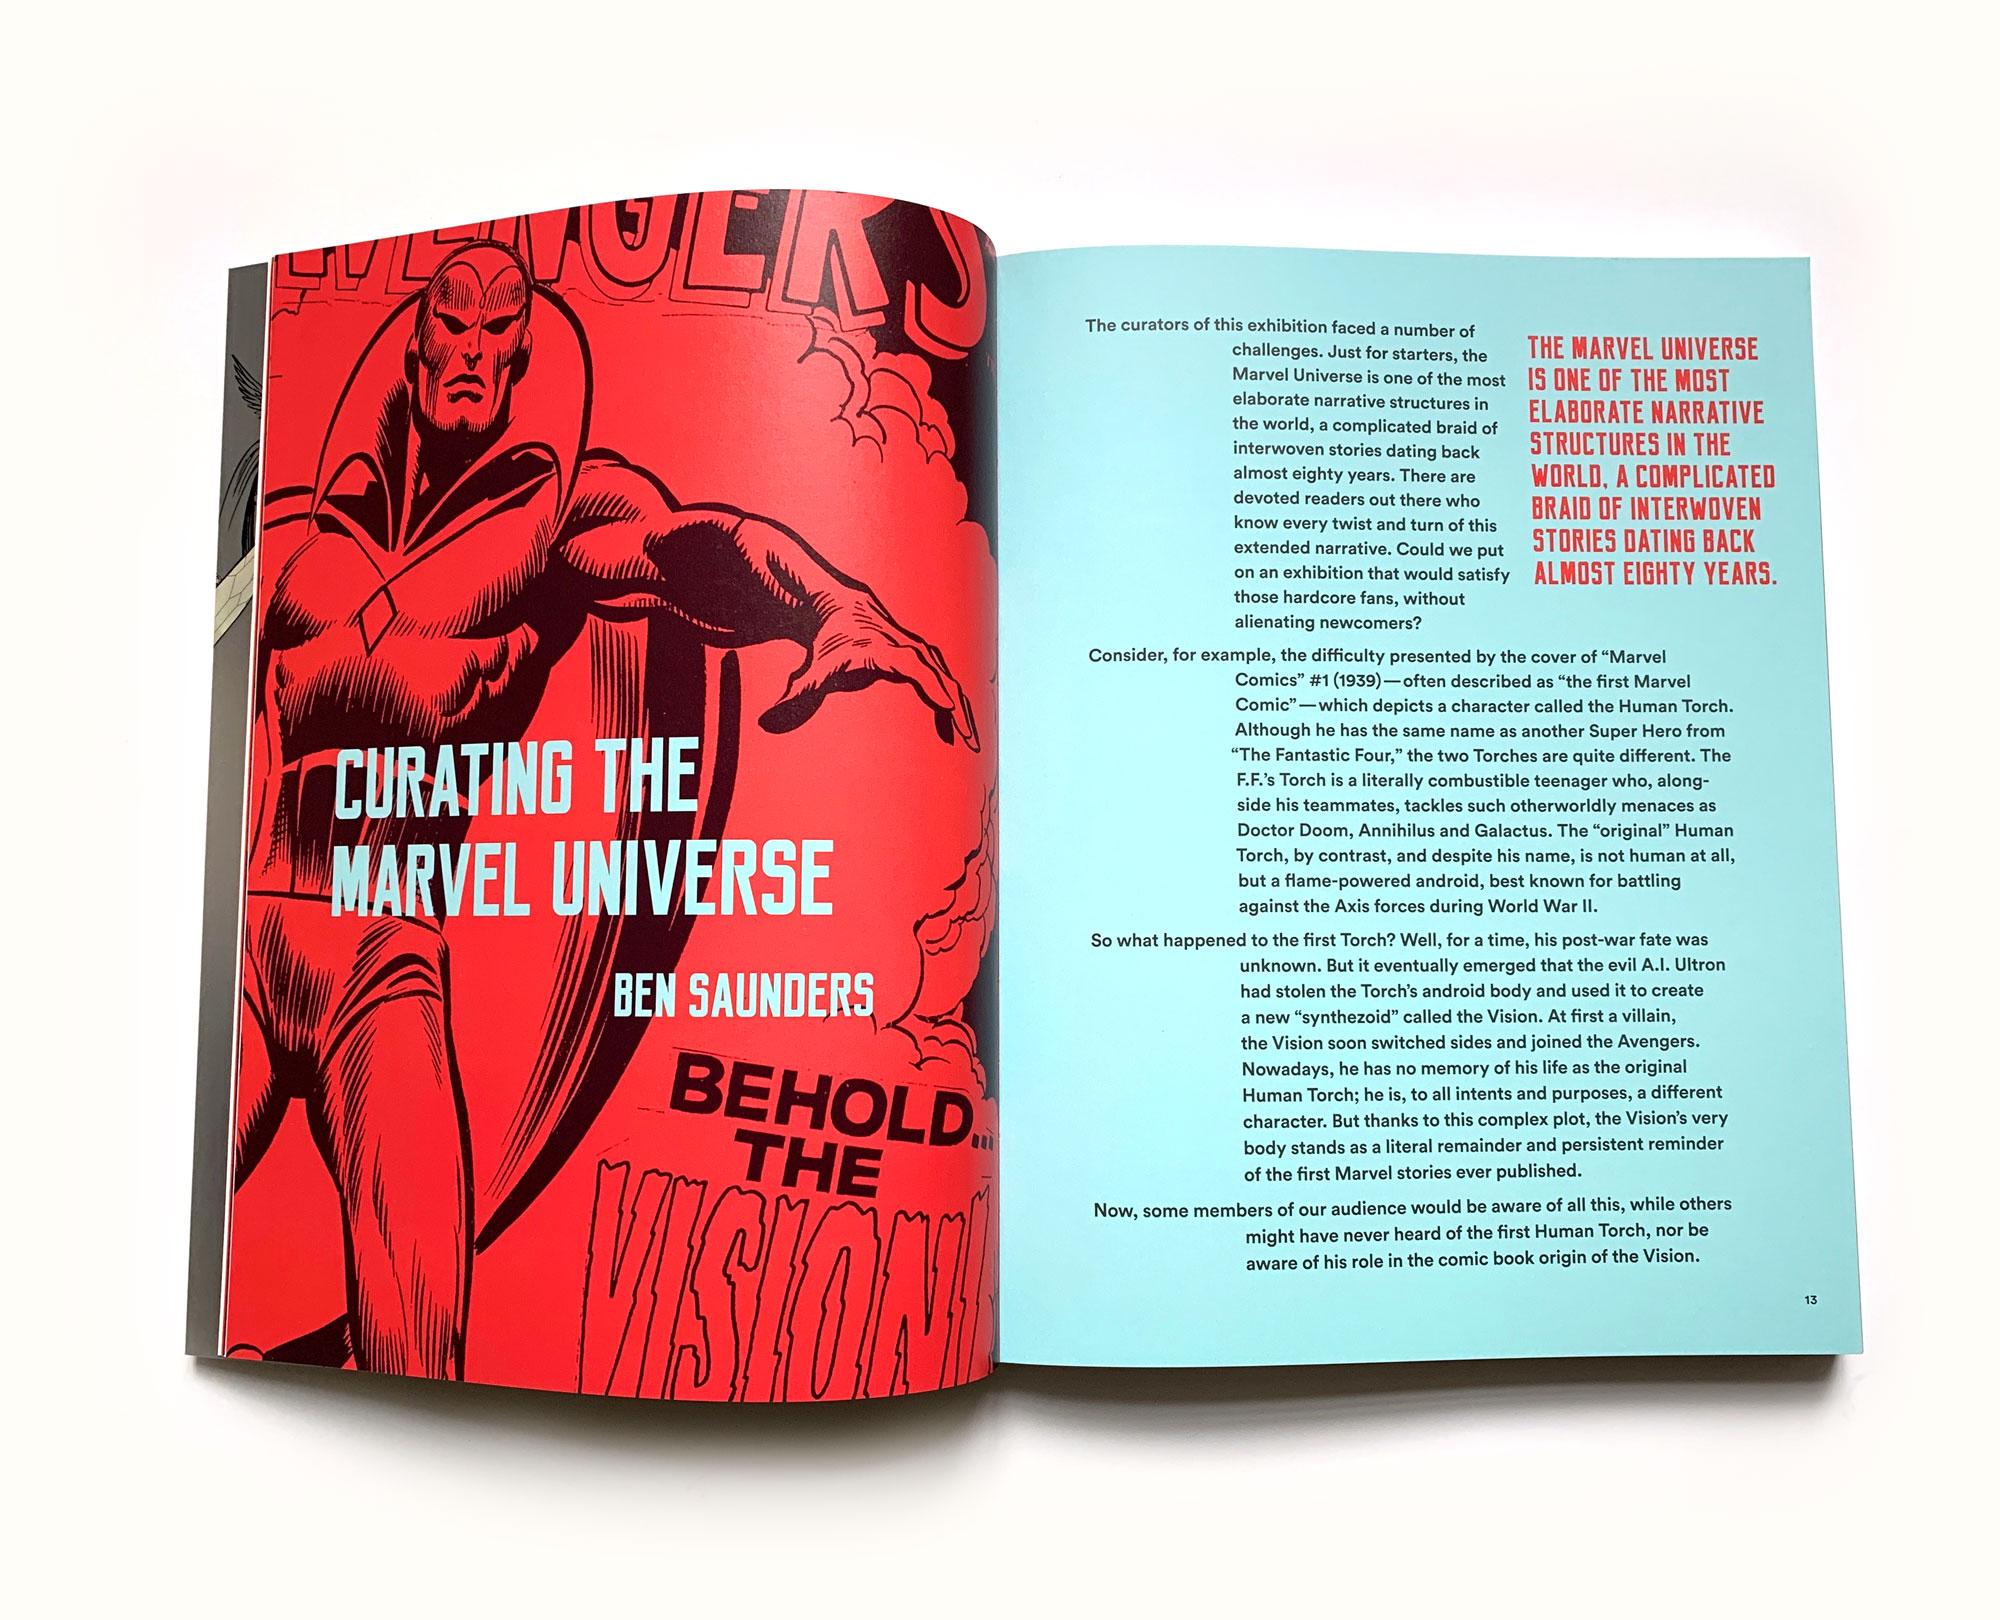 Marvel-Universe-of-Super-Heroes-Book-Balgavy-Avengers-Curating.jpg